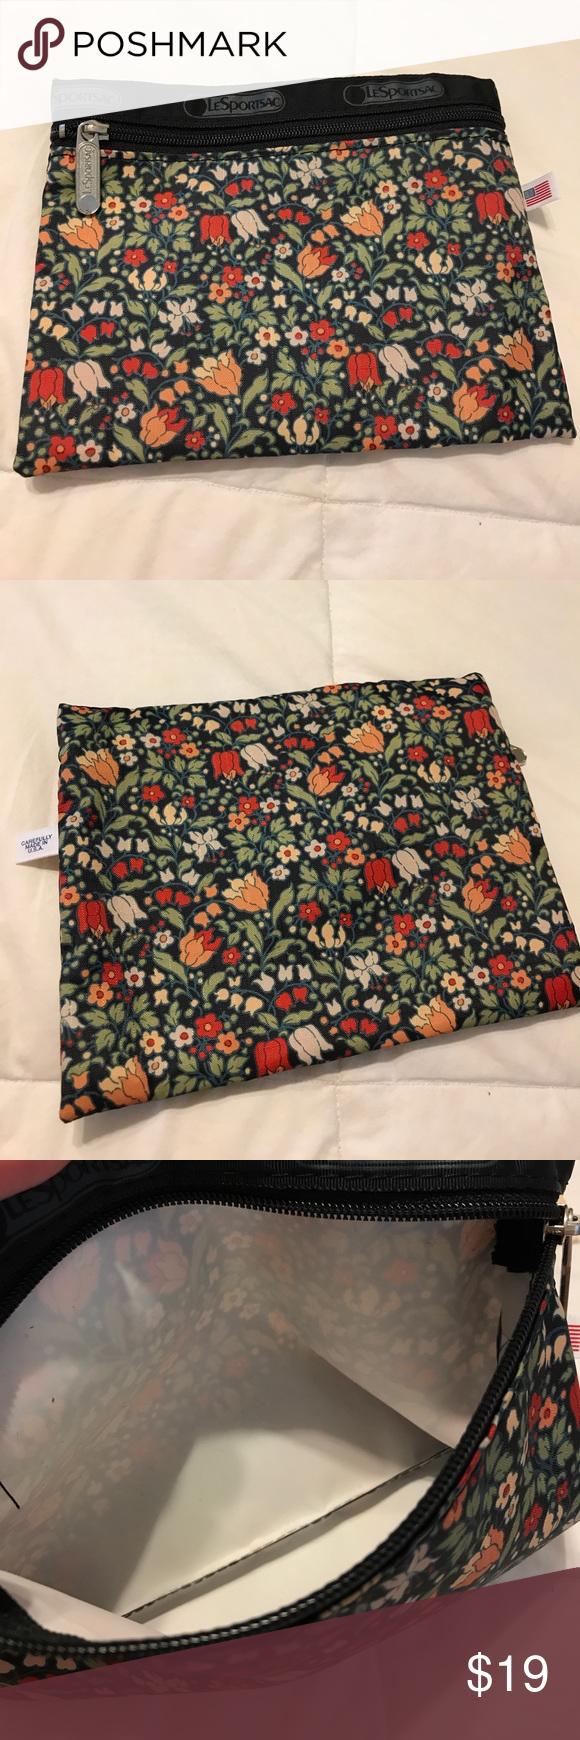 New Lesportsac Cosmetic Bag Fl Print 8x6 One Zipper Bags Cases